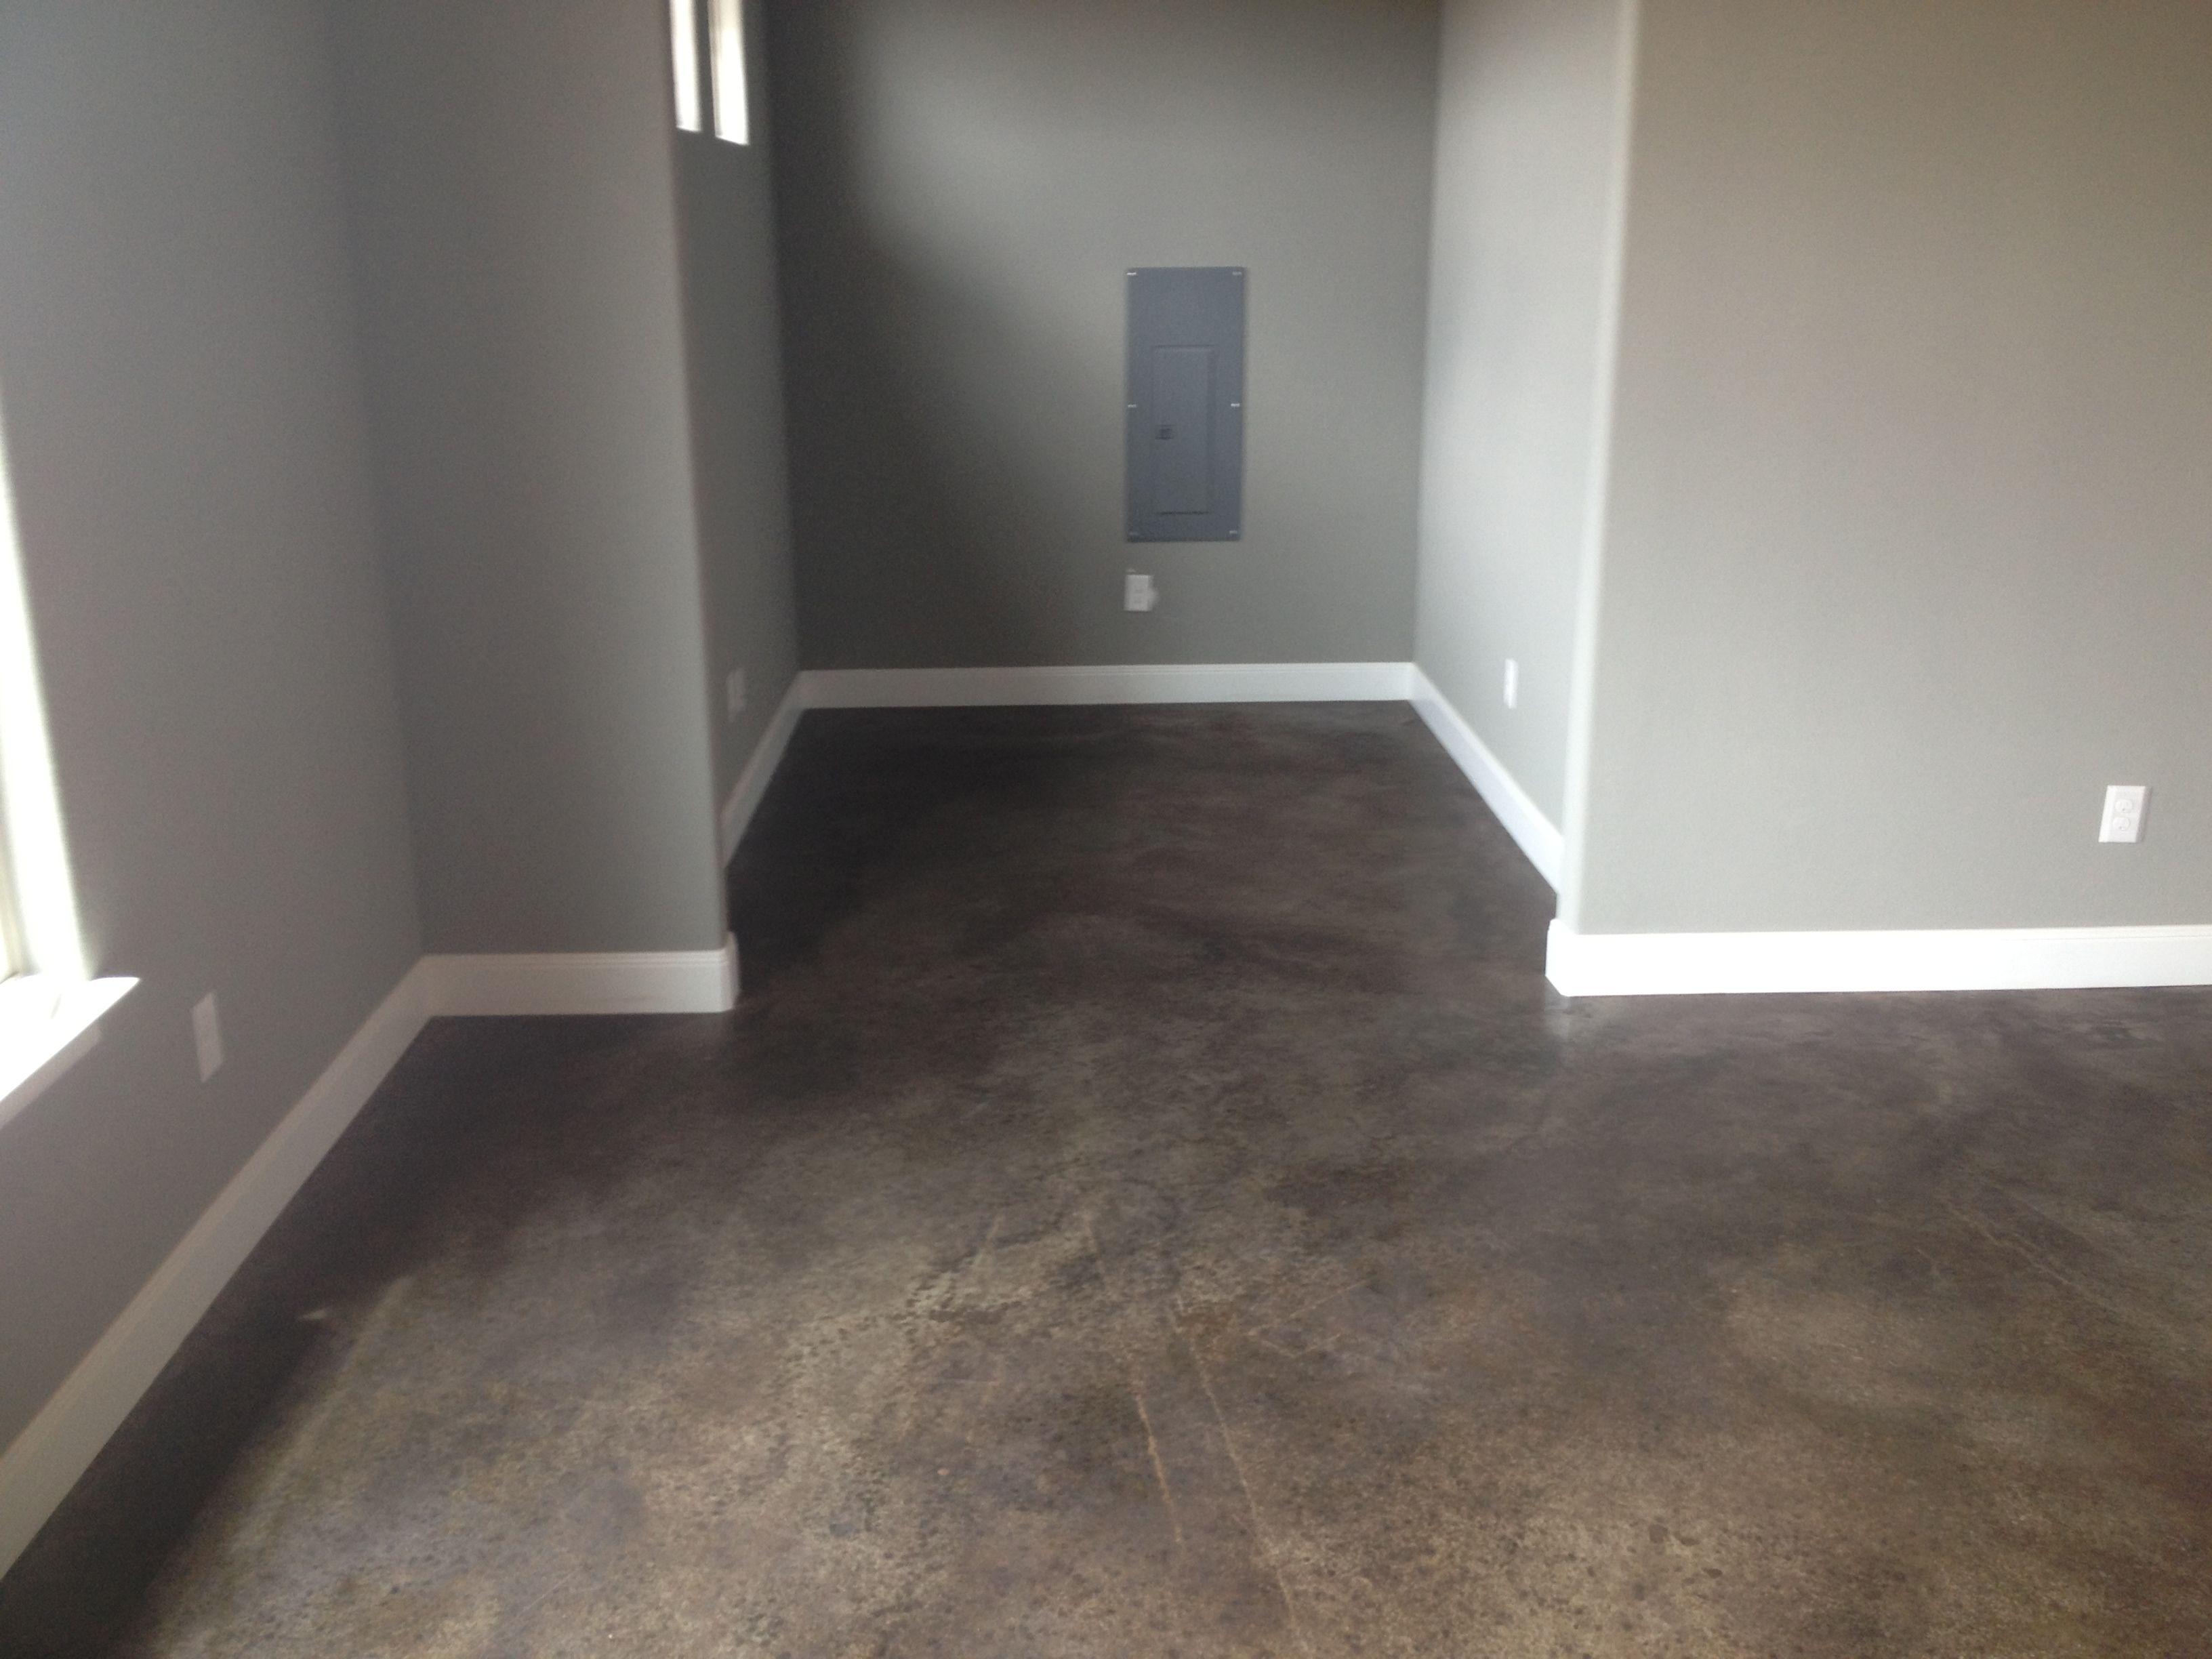 Stained Concrete Floors  Floors  Concrete floors